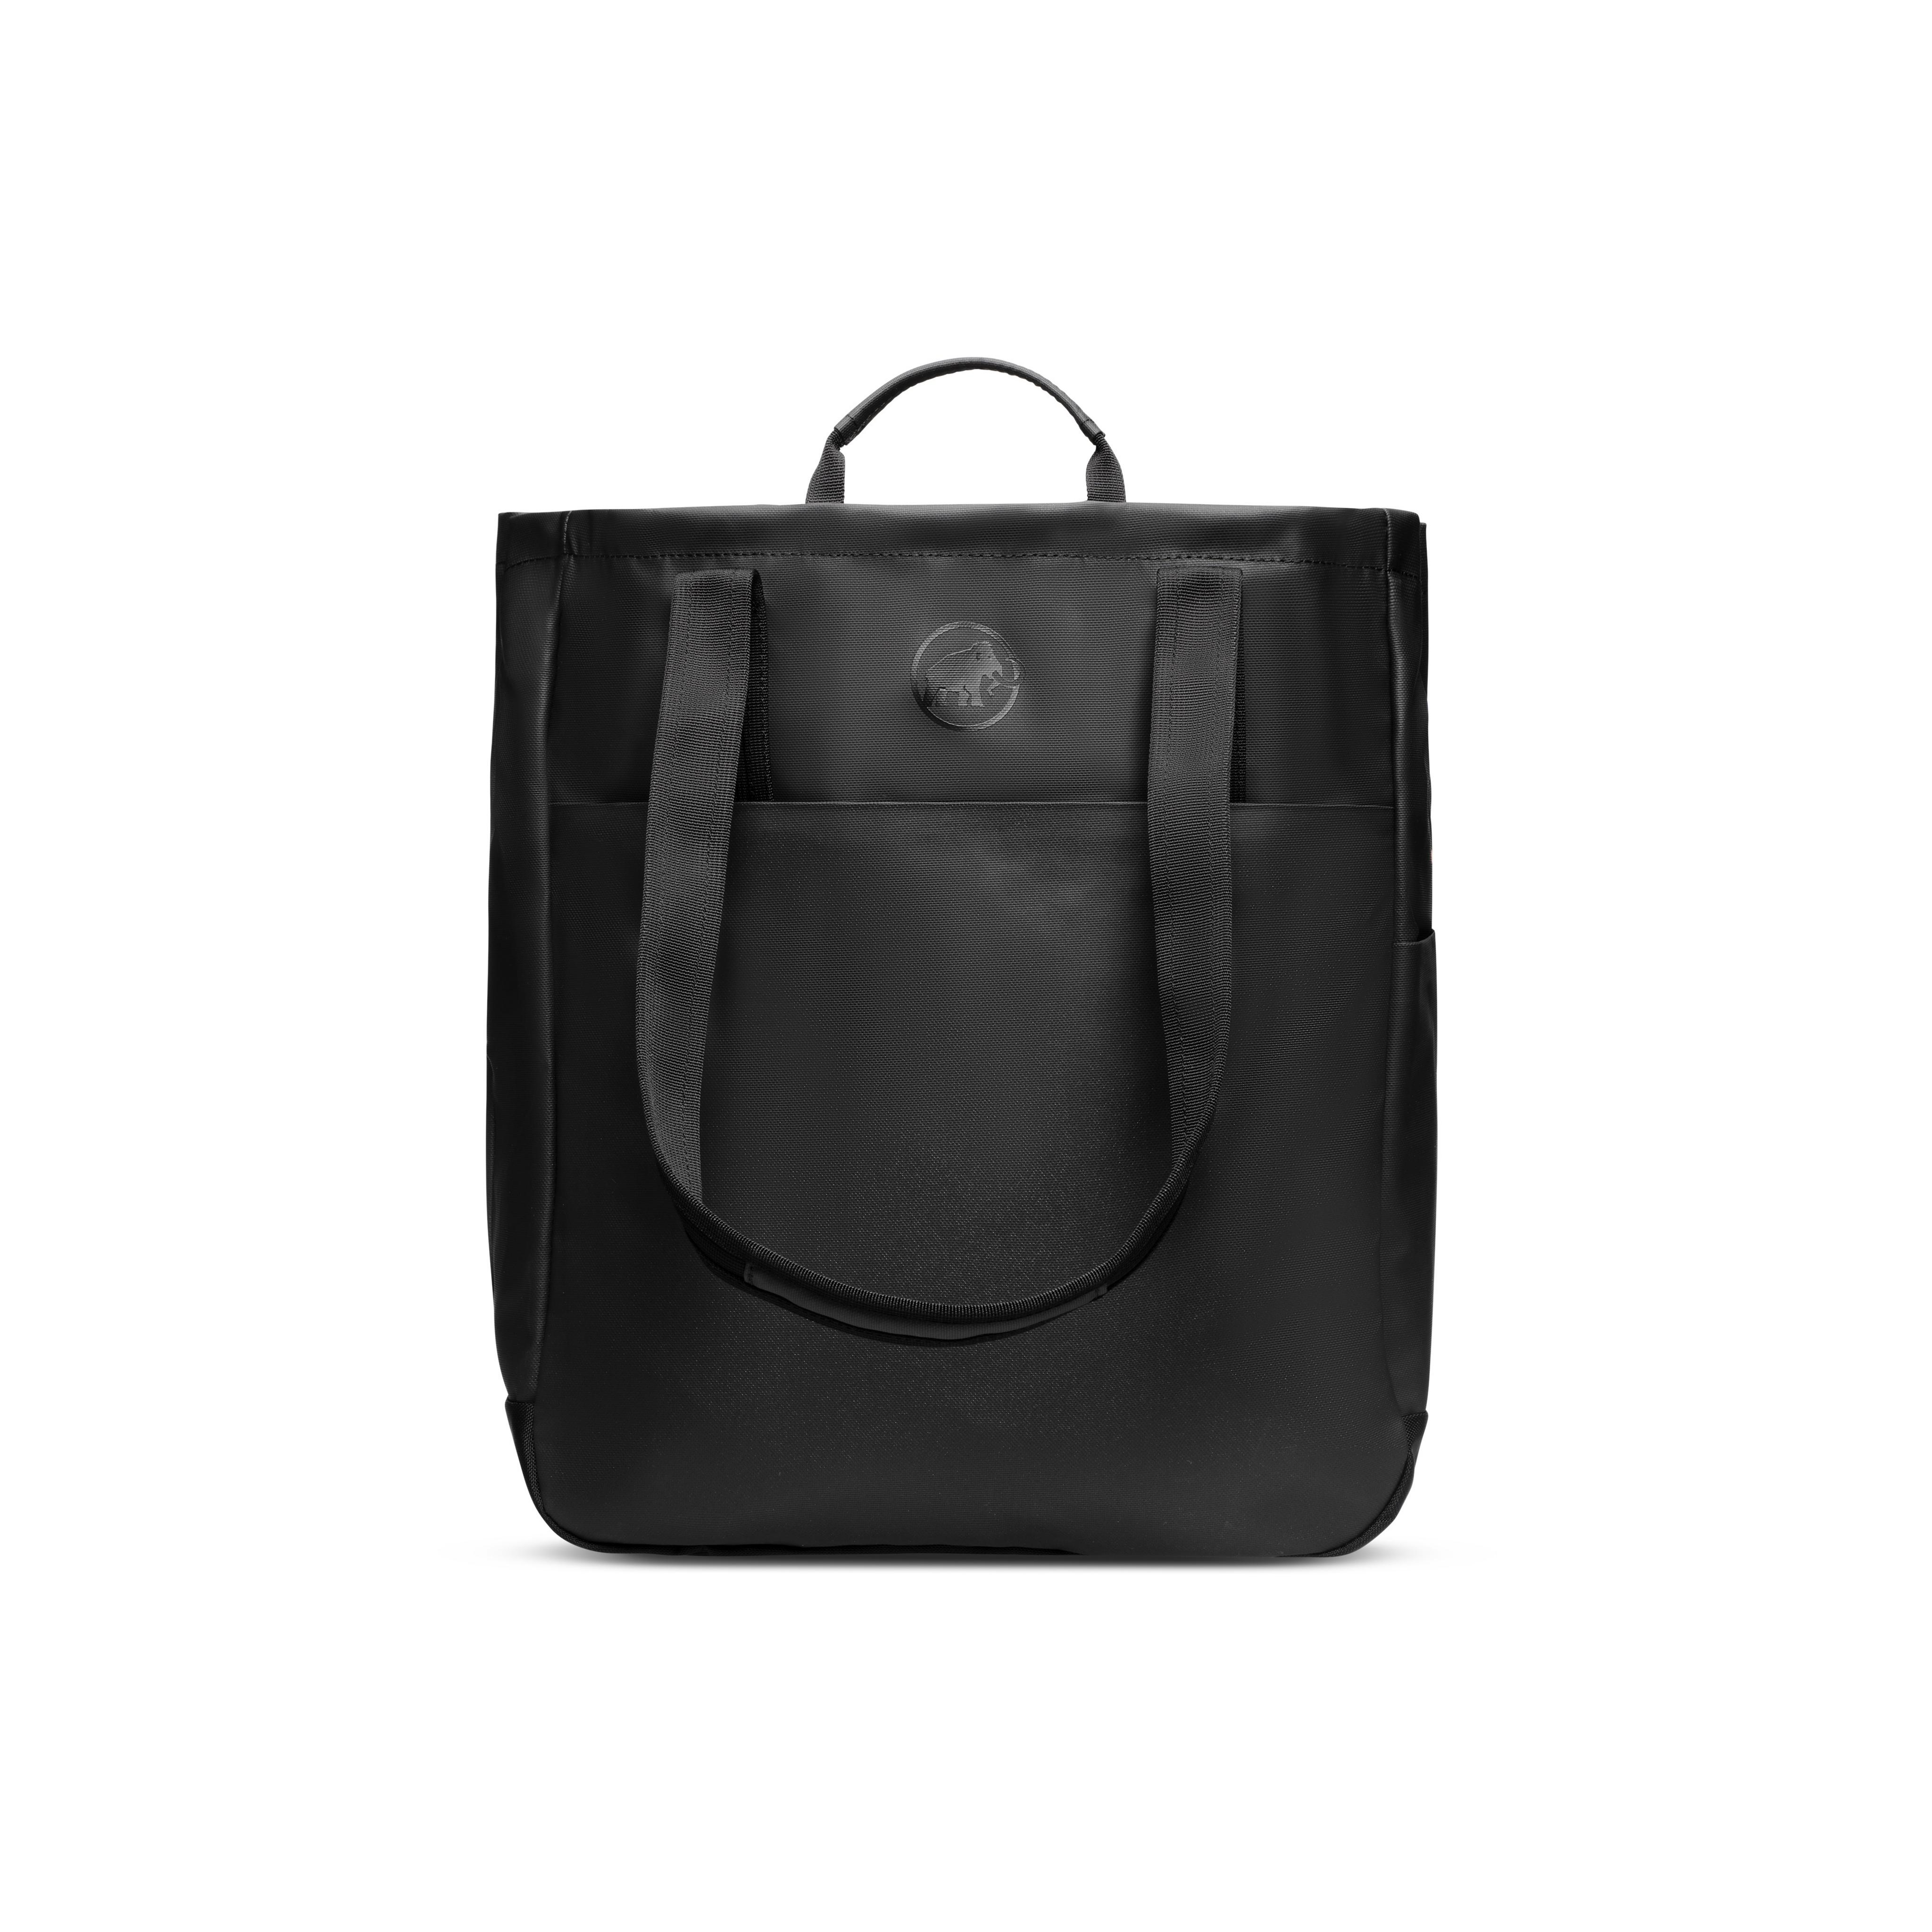 Seon Tote Bag - 15 L, black thumbnail